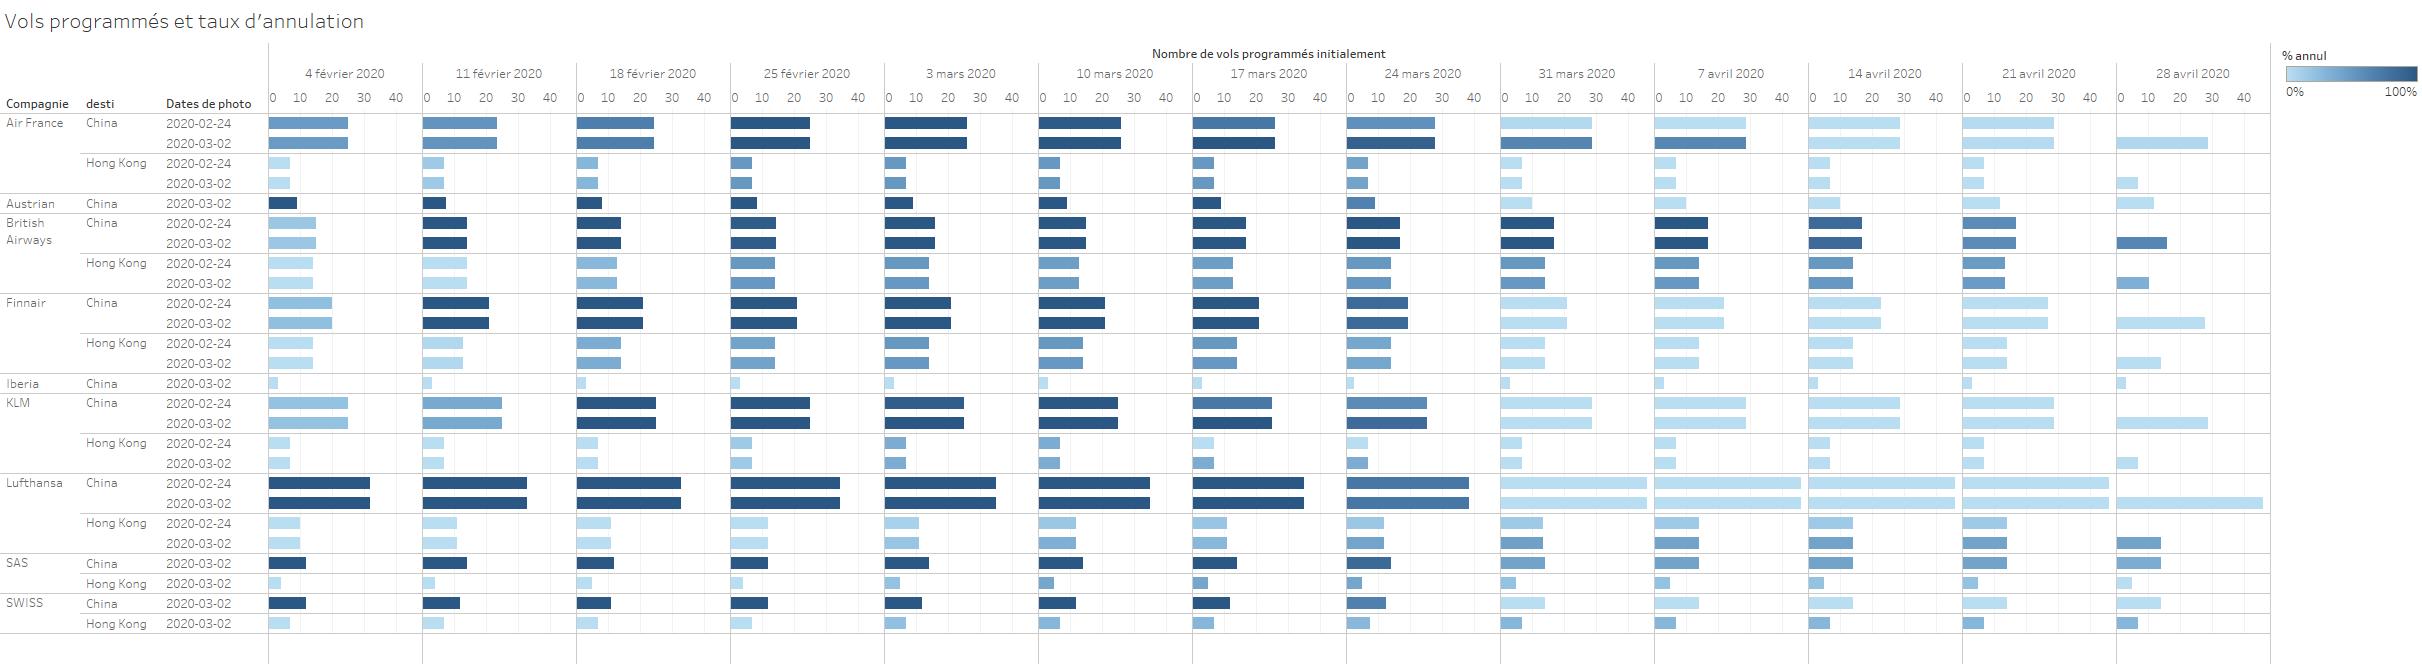 Evolution du taux d'annulation HKG et Chine